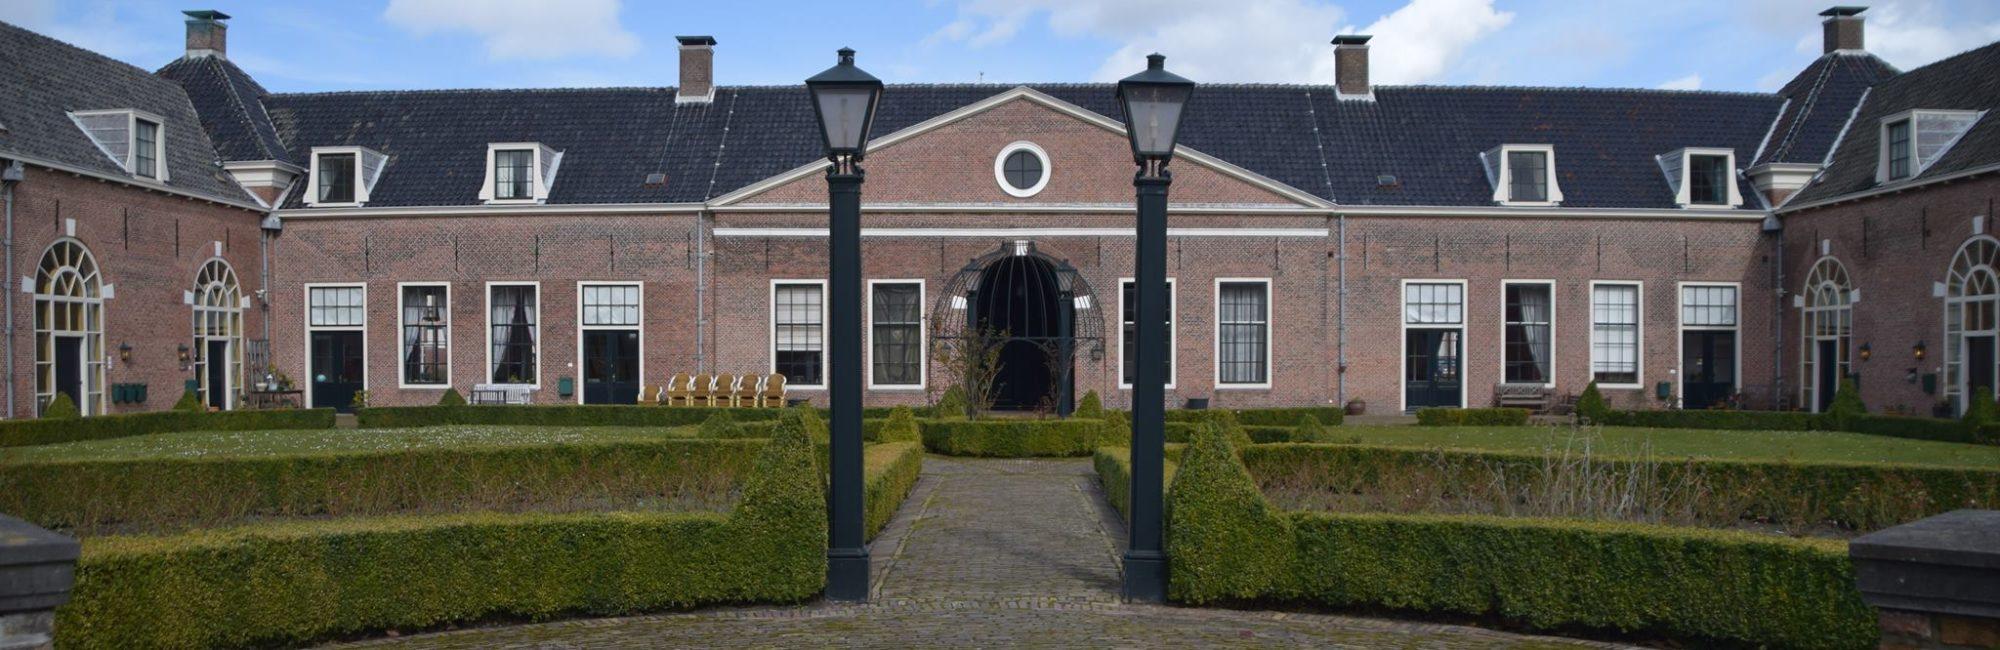 De Nederhof (monumentaal)